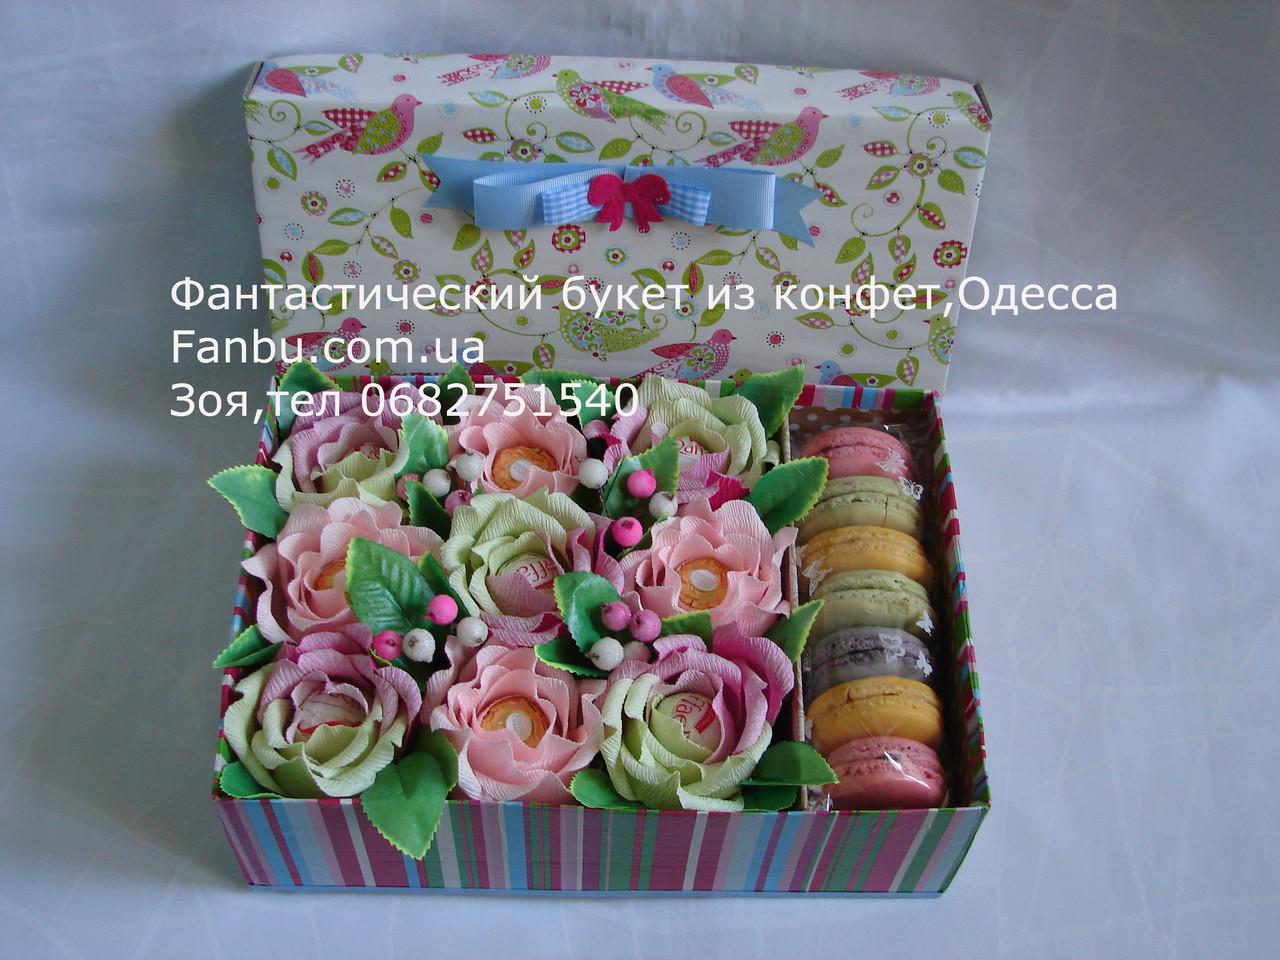 Свит бокс-средний с конфетами и макаронсами, фото 1